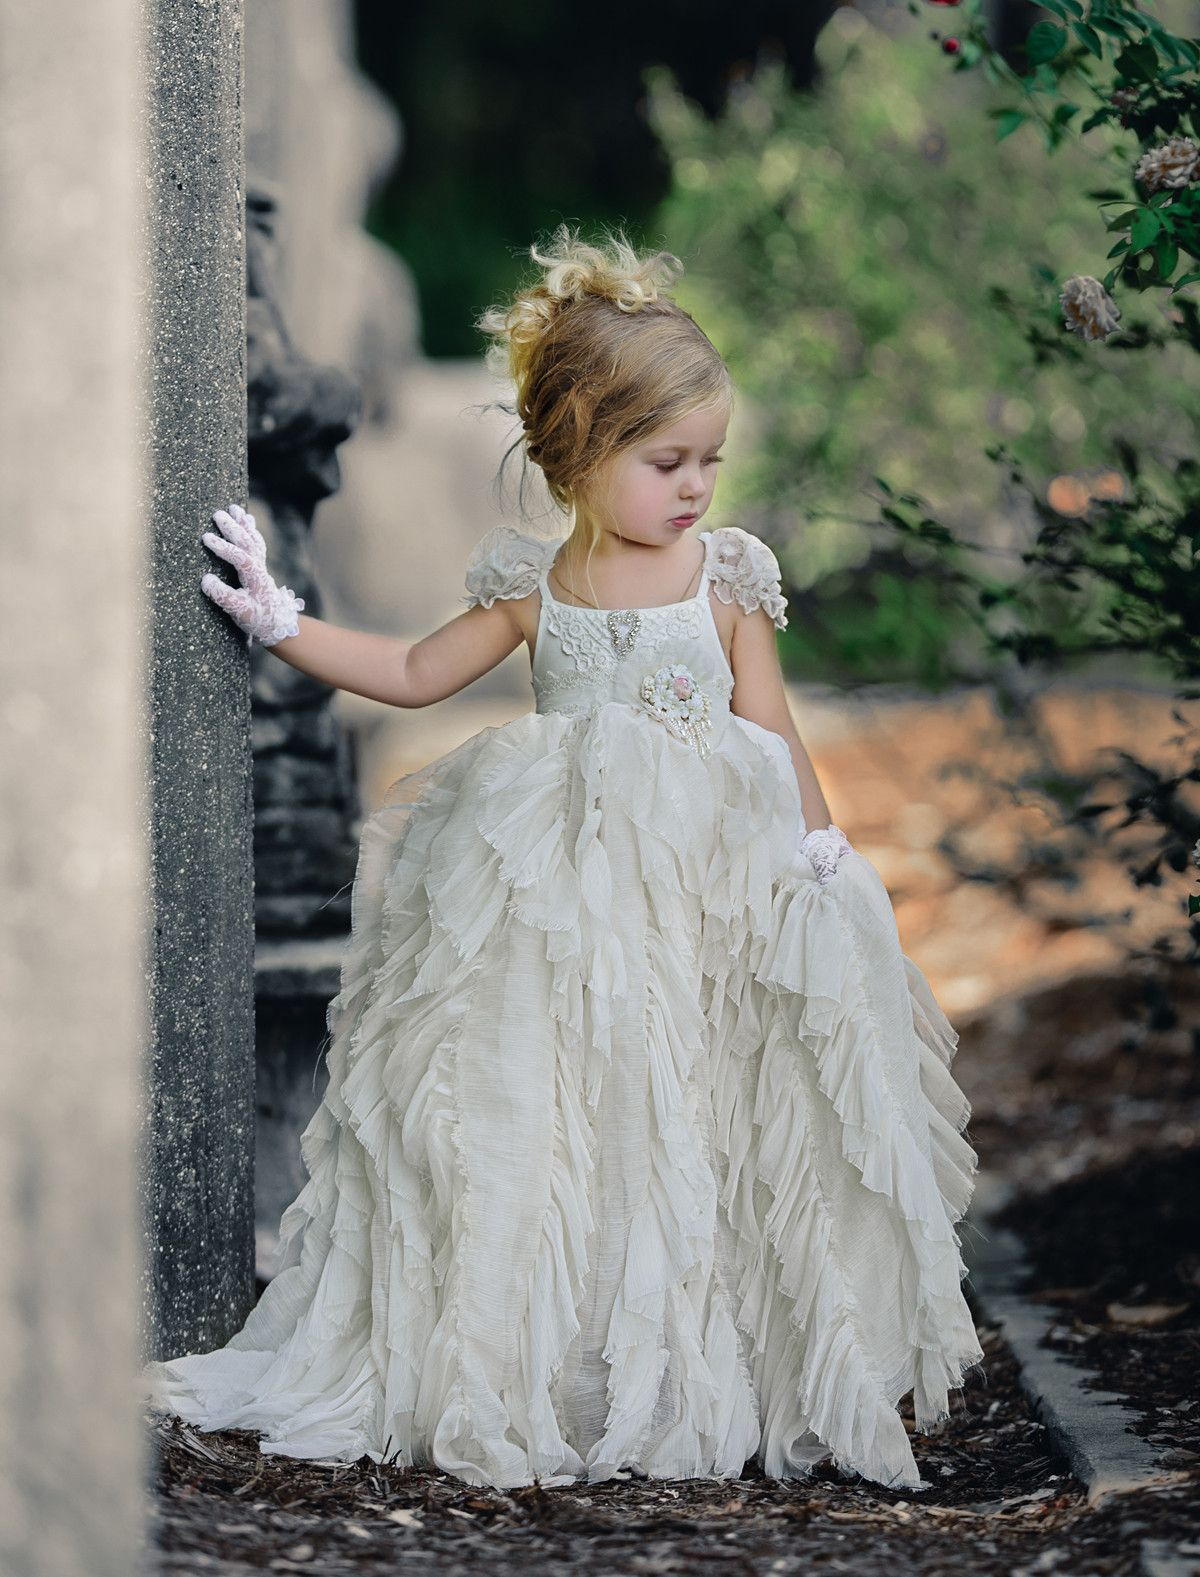 Frothy frock kiddies pinterest wedding and weddings weddings ombrellifo Image collections